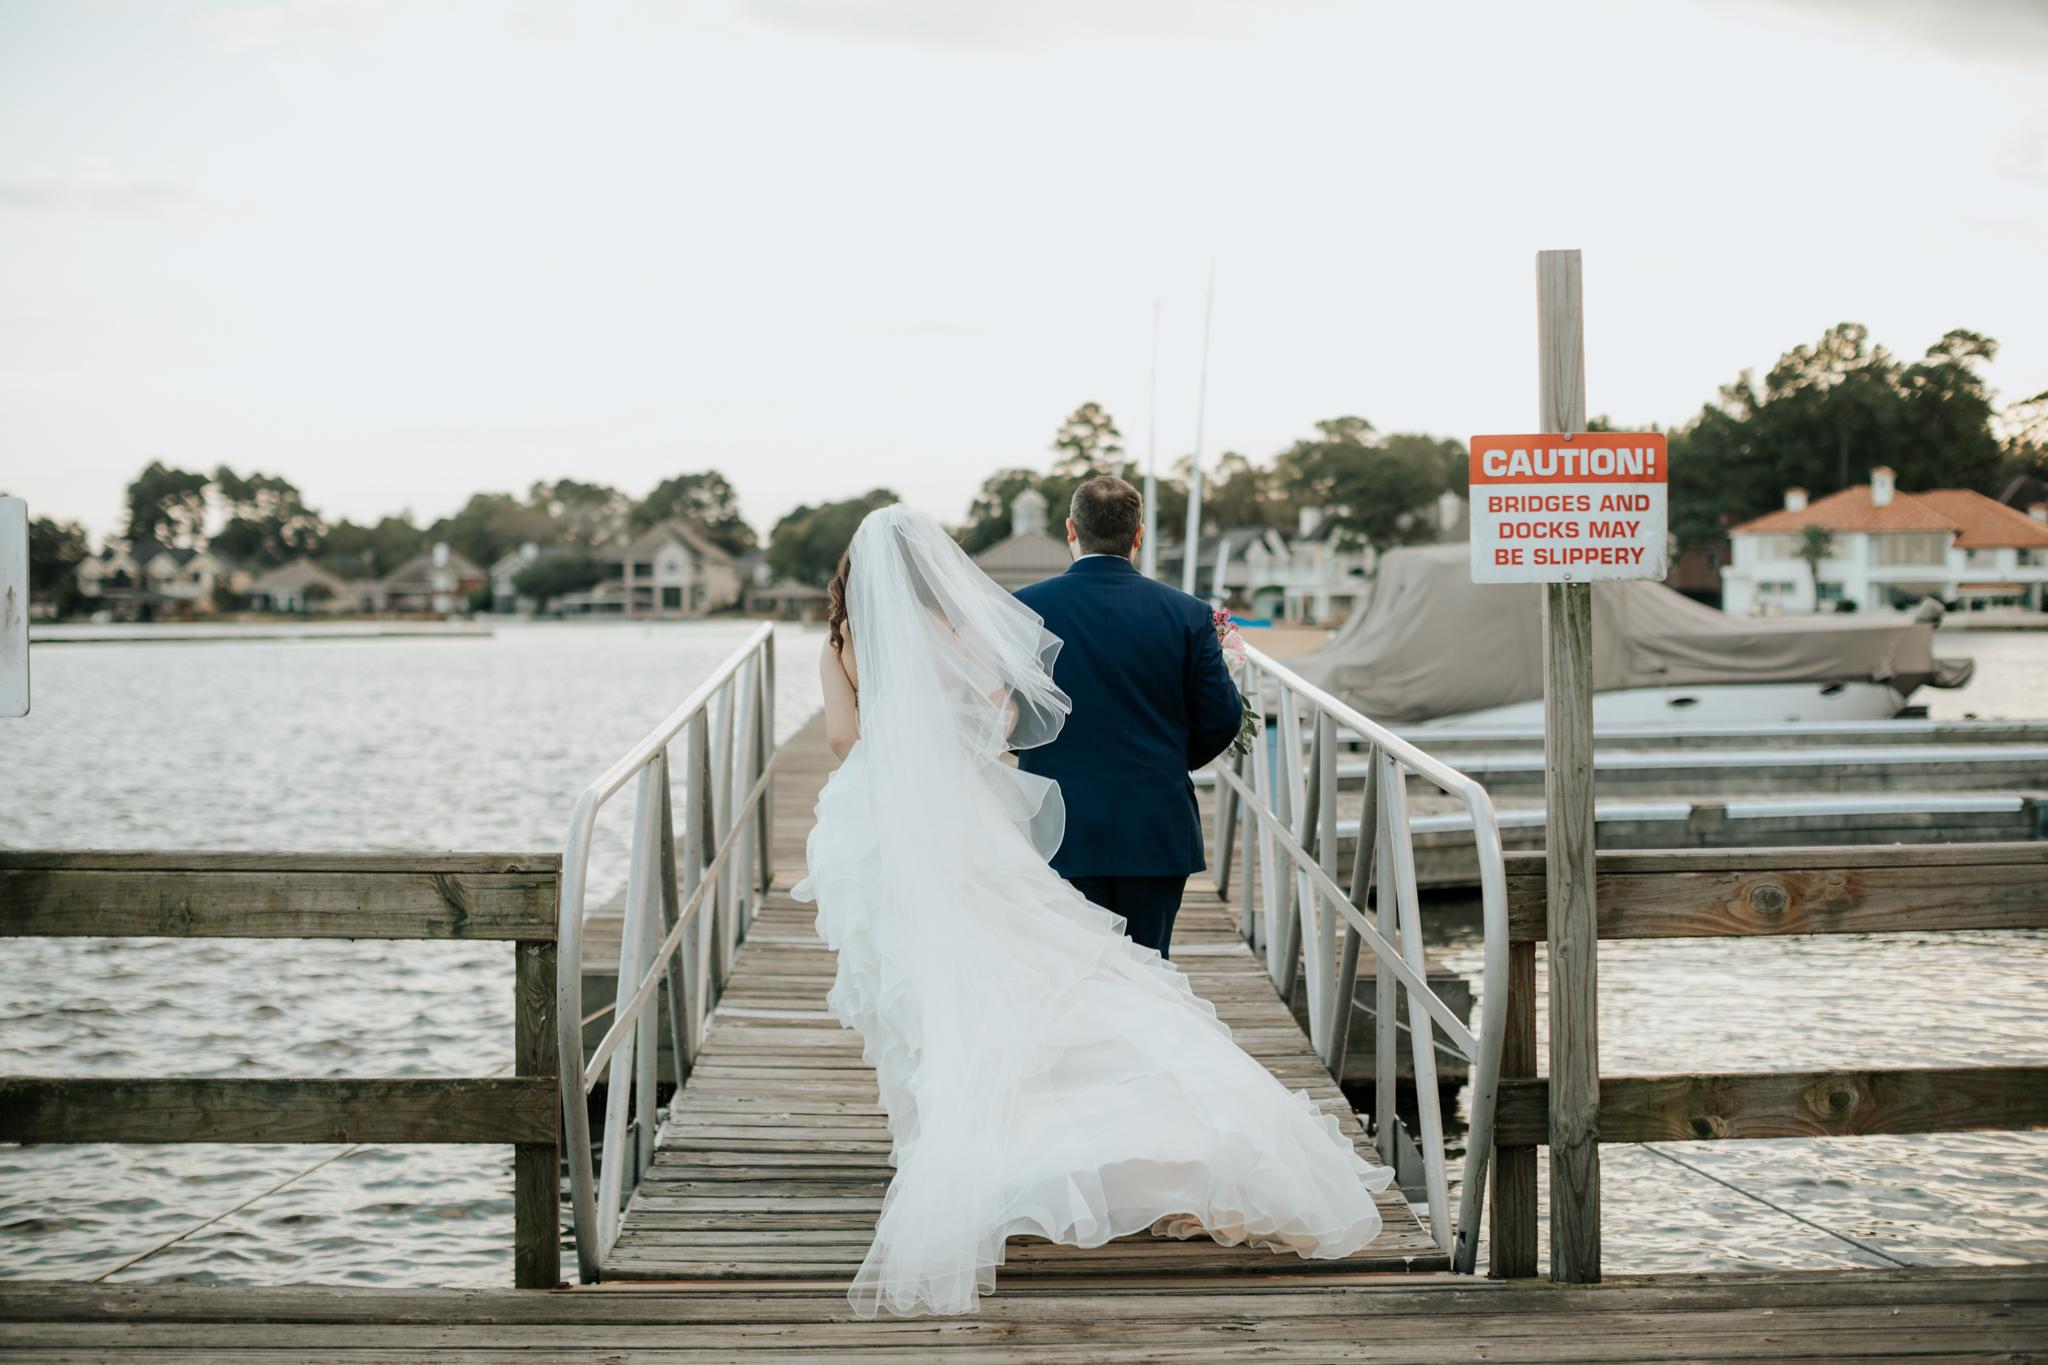 Leah Nicole Photography - Houston Wedding Photographer-Lake Conroe Wedding- Houston Wedding Photographer-41.jpg